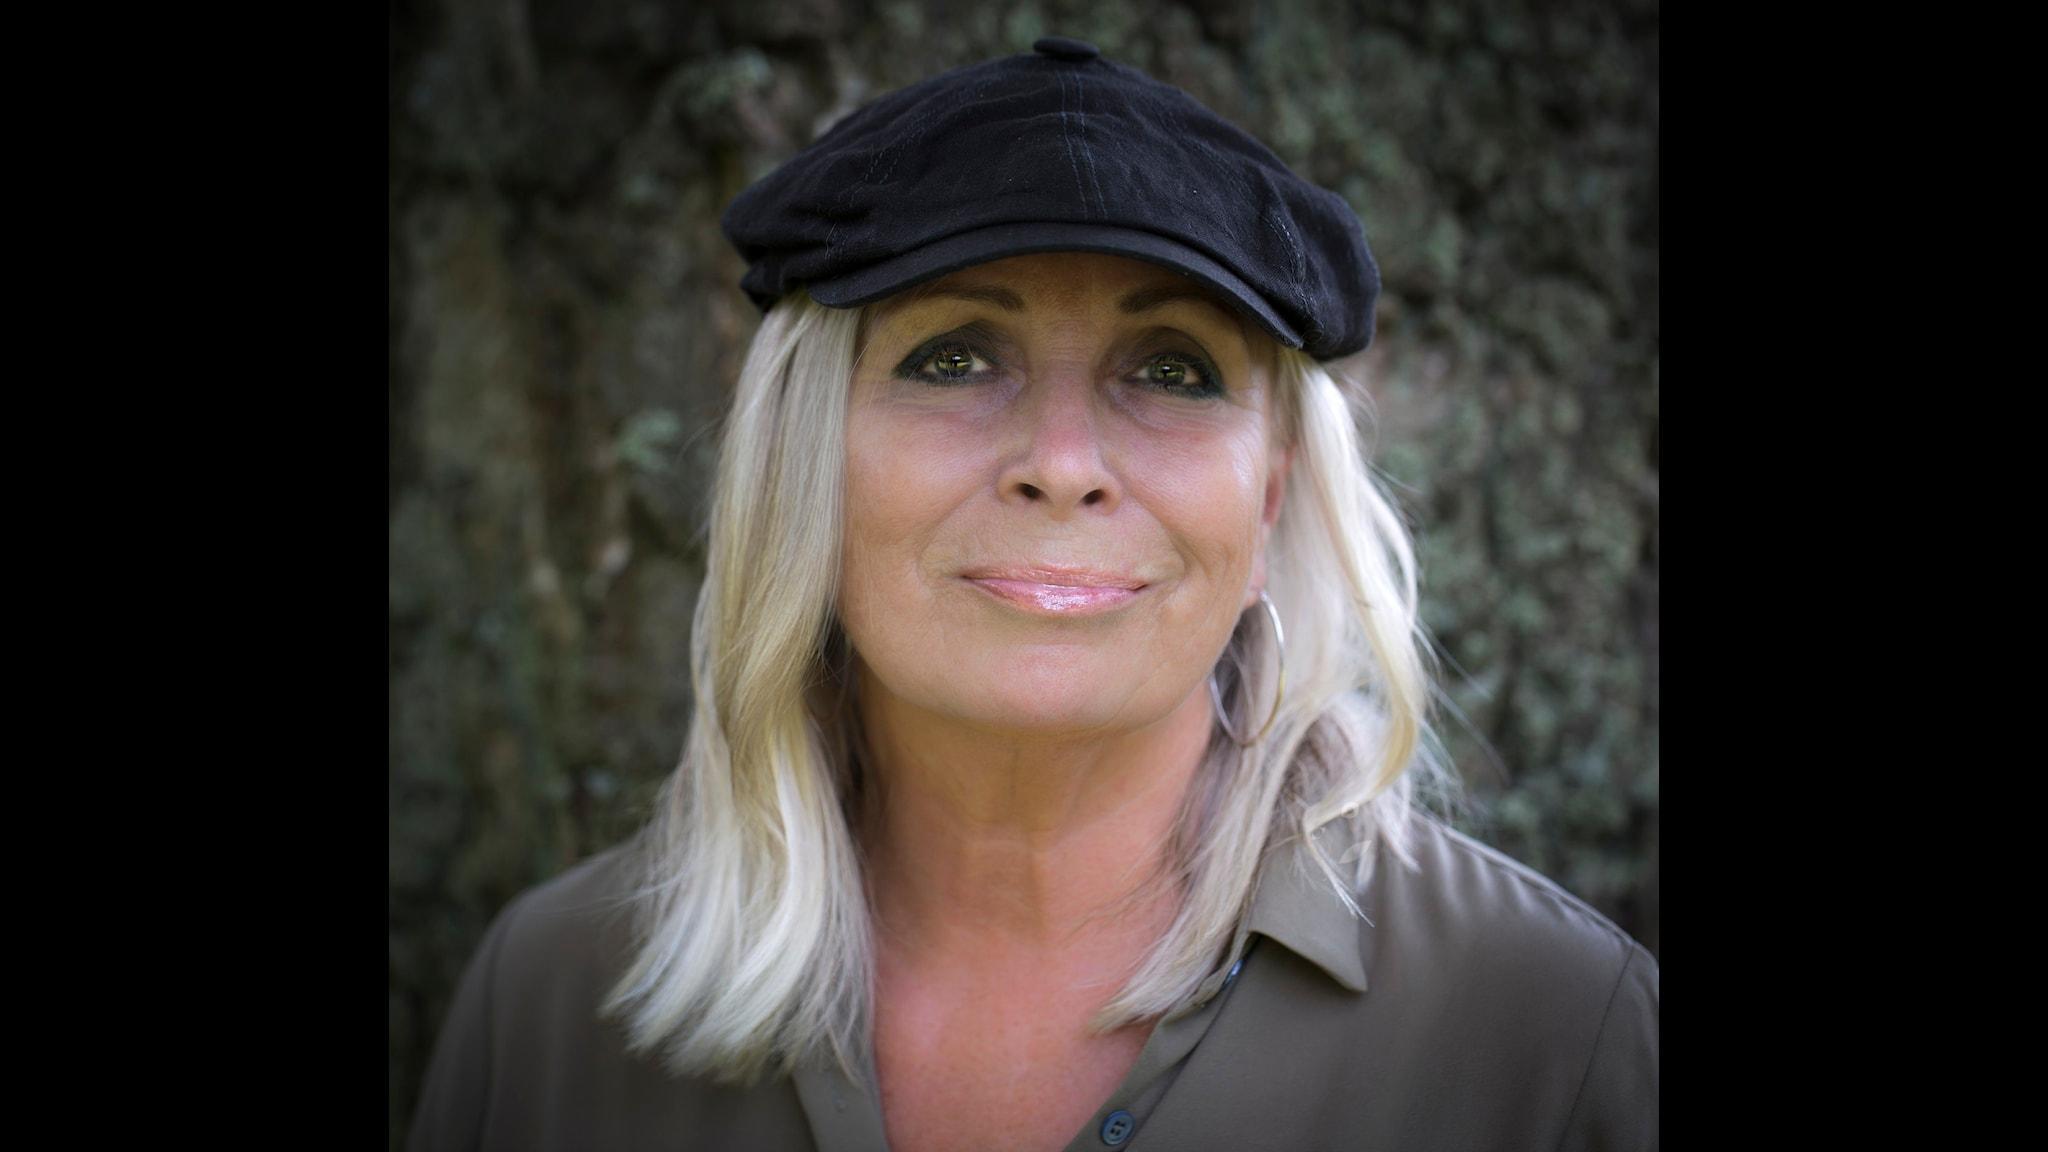 Marie Bergman - Jag vill ha mitt liv, mitt eget liv